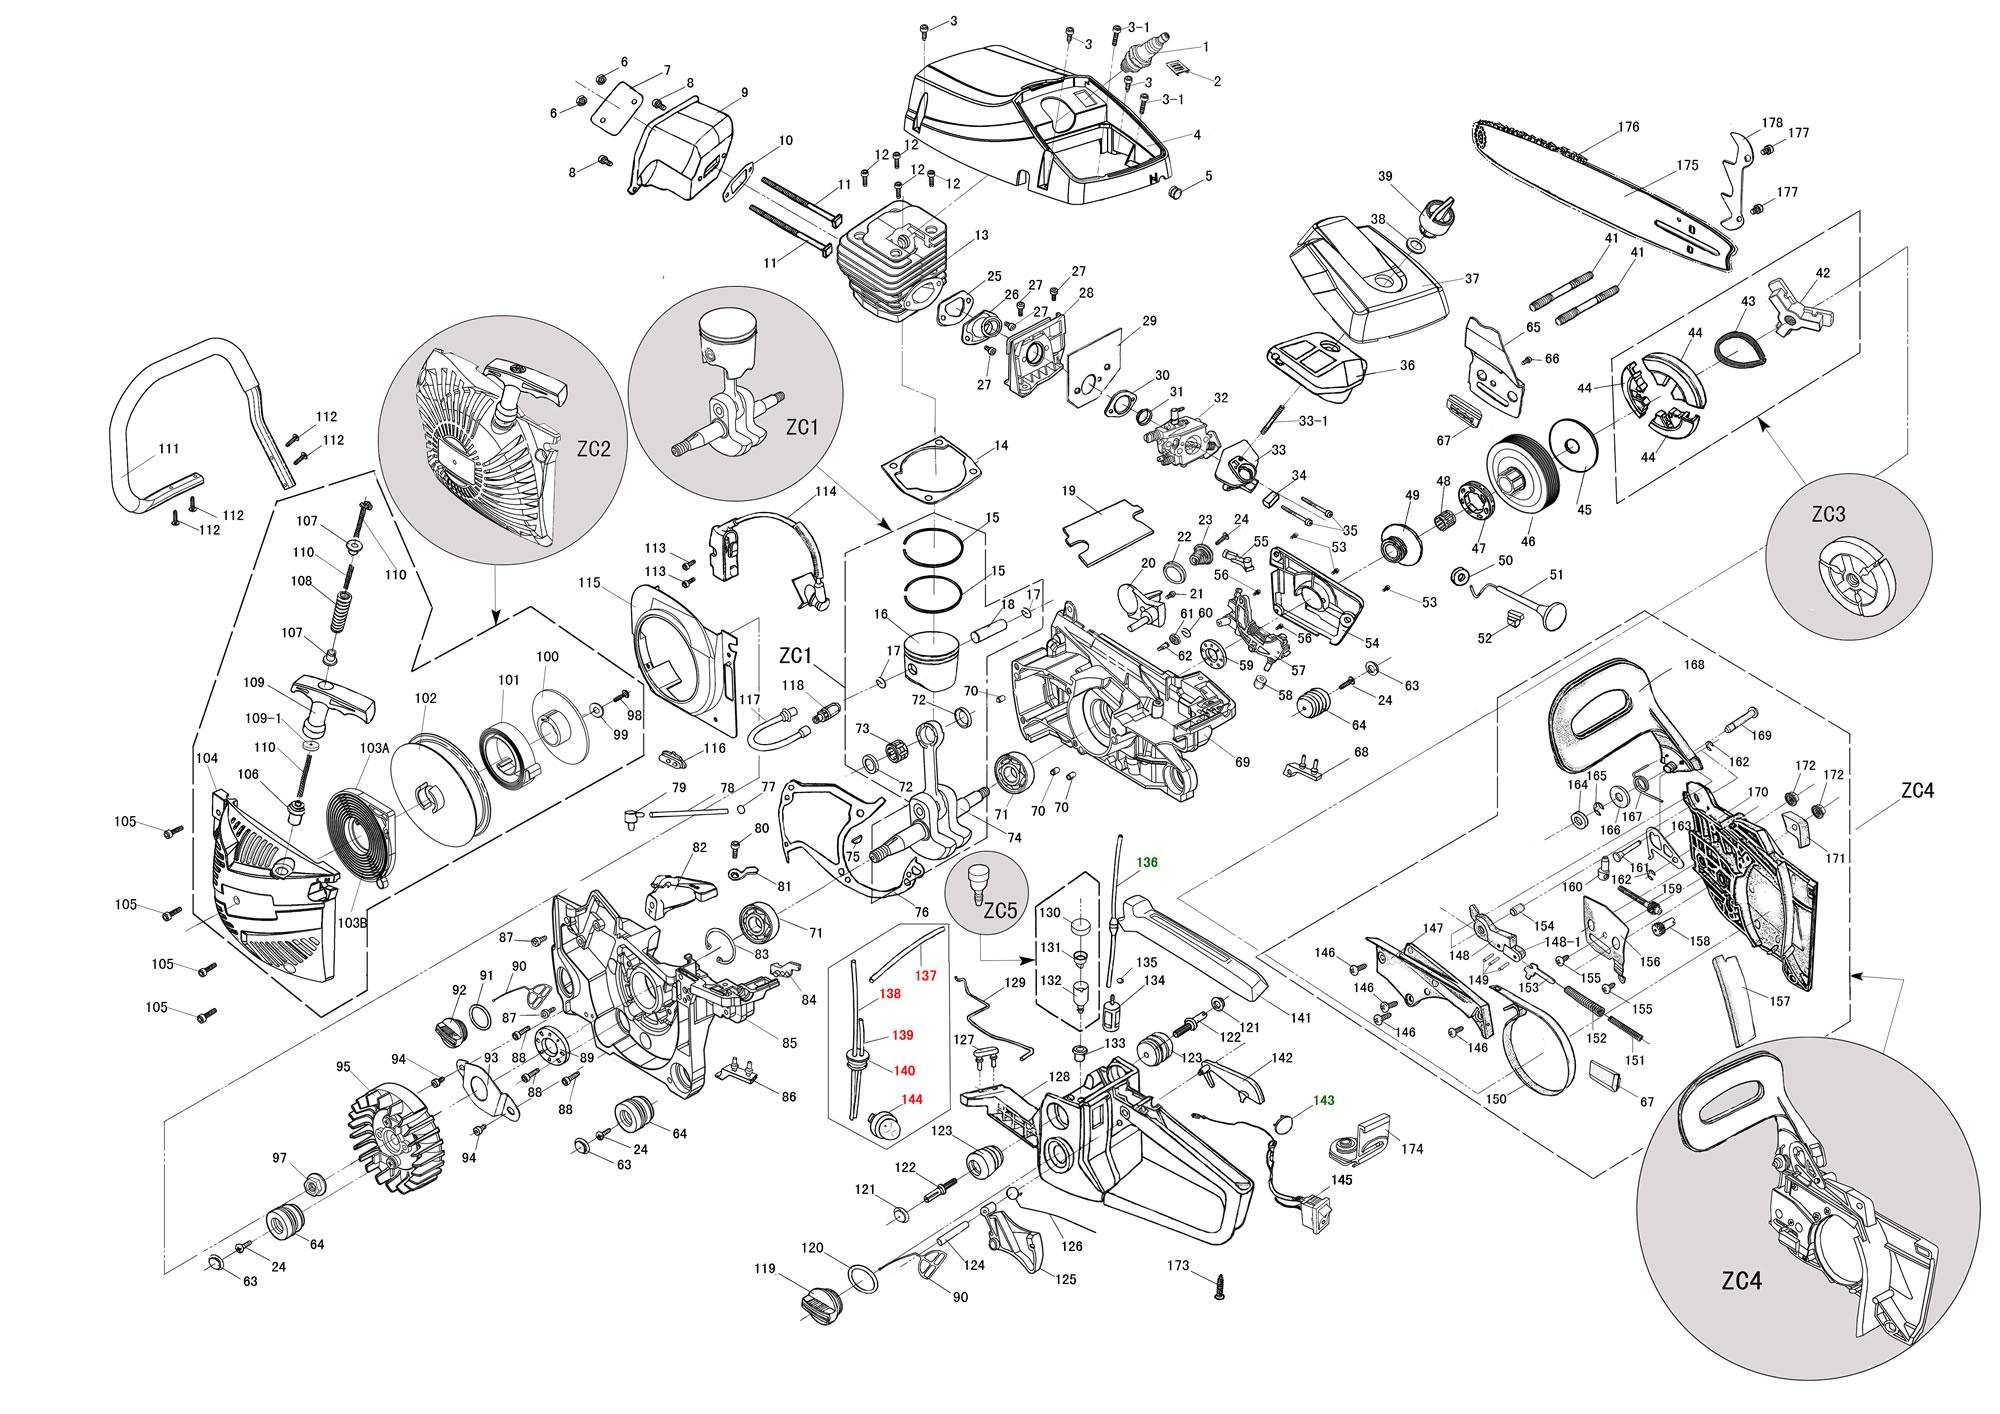 A John Deere Ke Parts besides Onderdelentekening Tt4518p P 18836 in addition  on onderdelentekening tt4518p p 18836